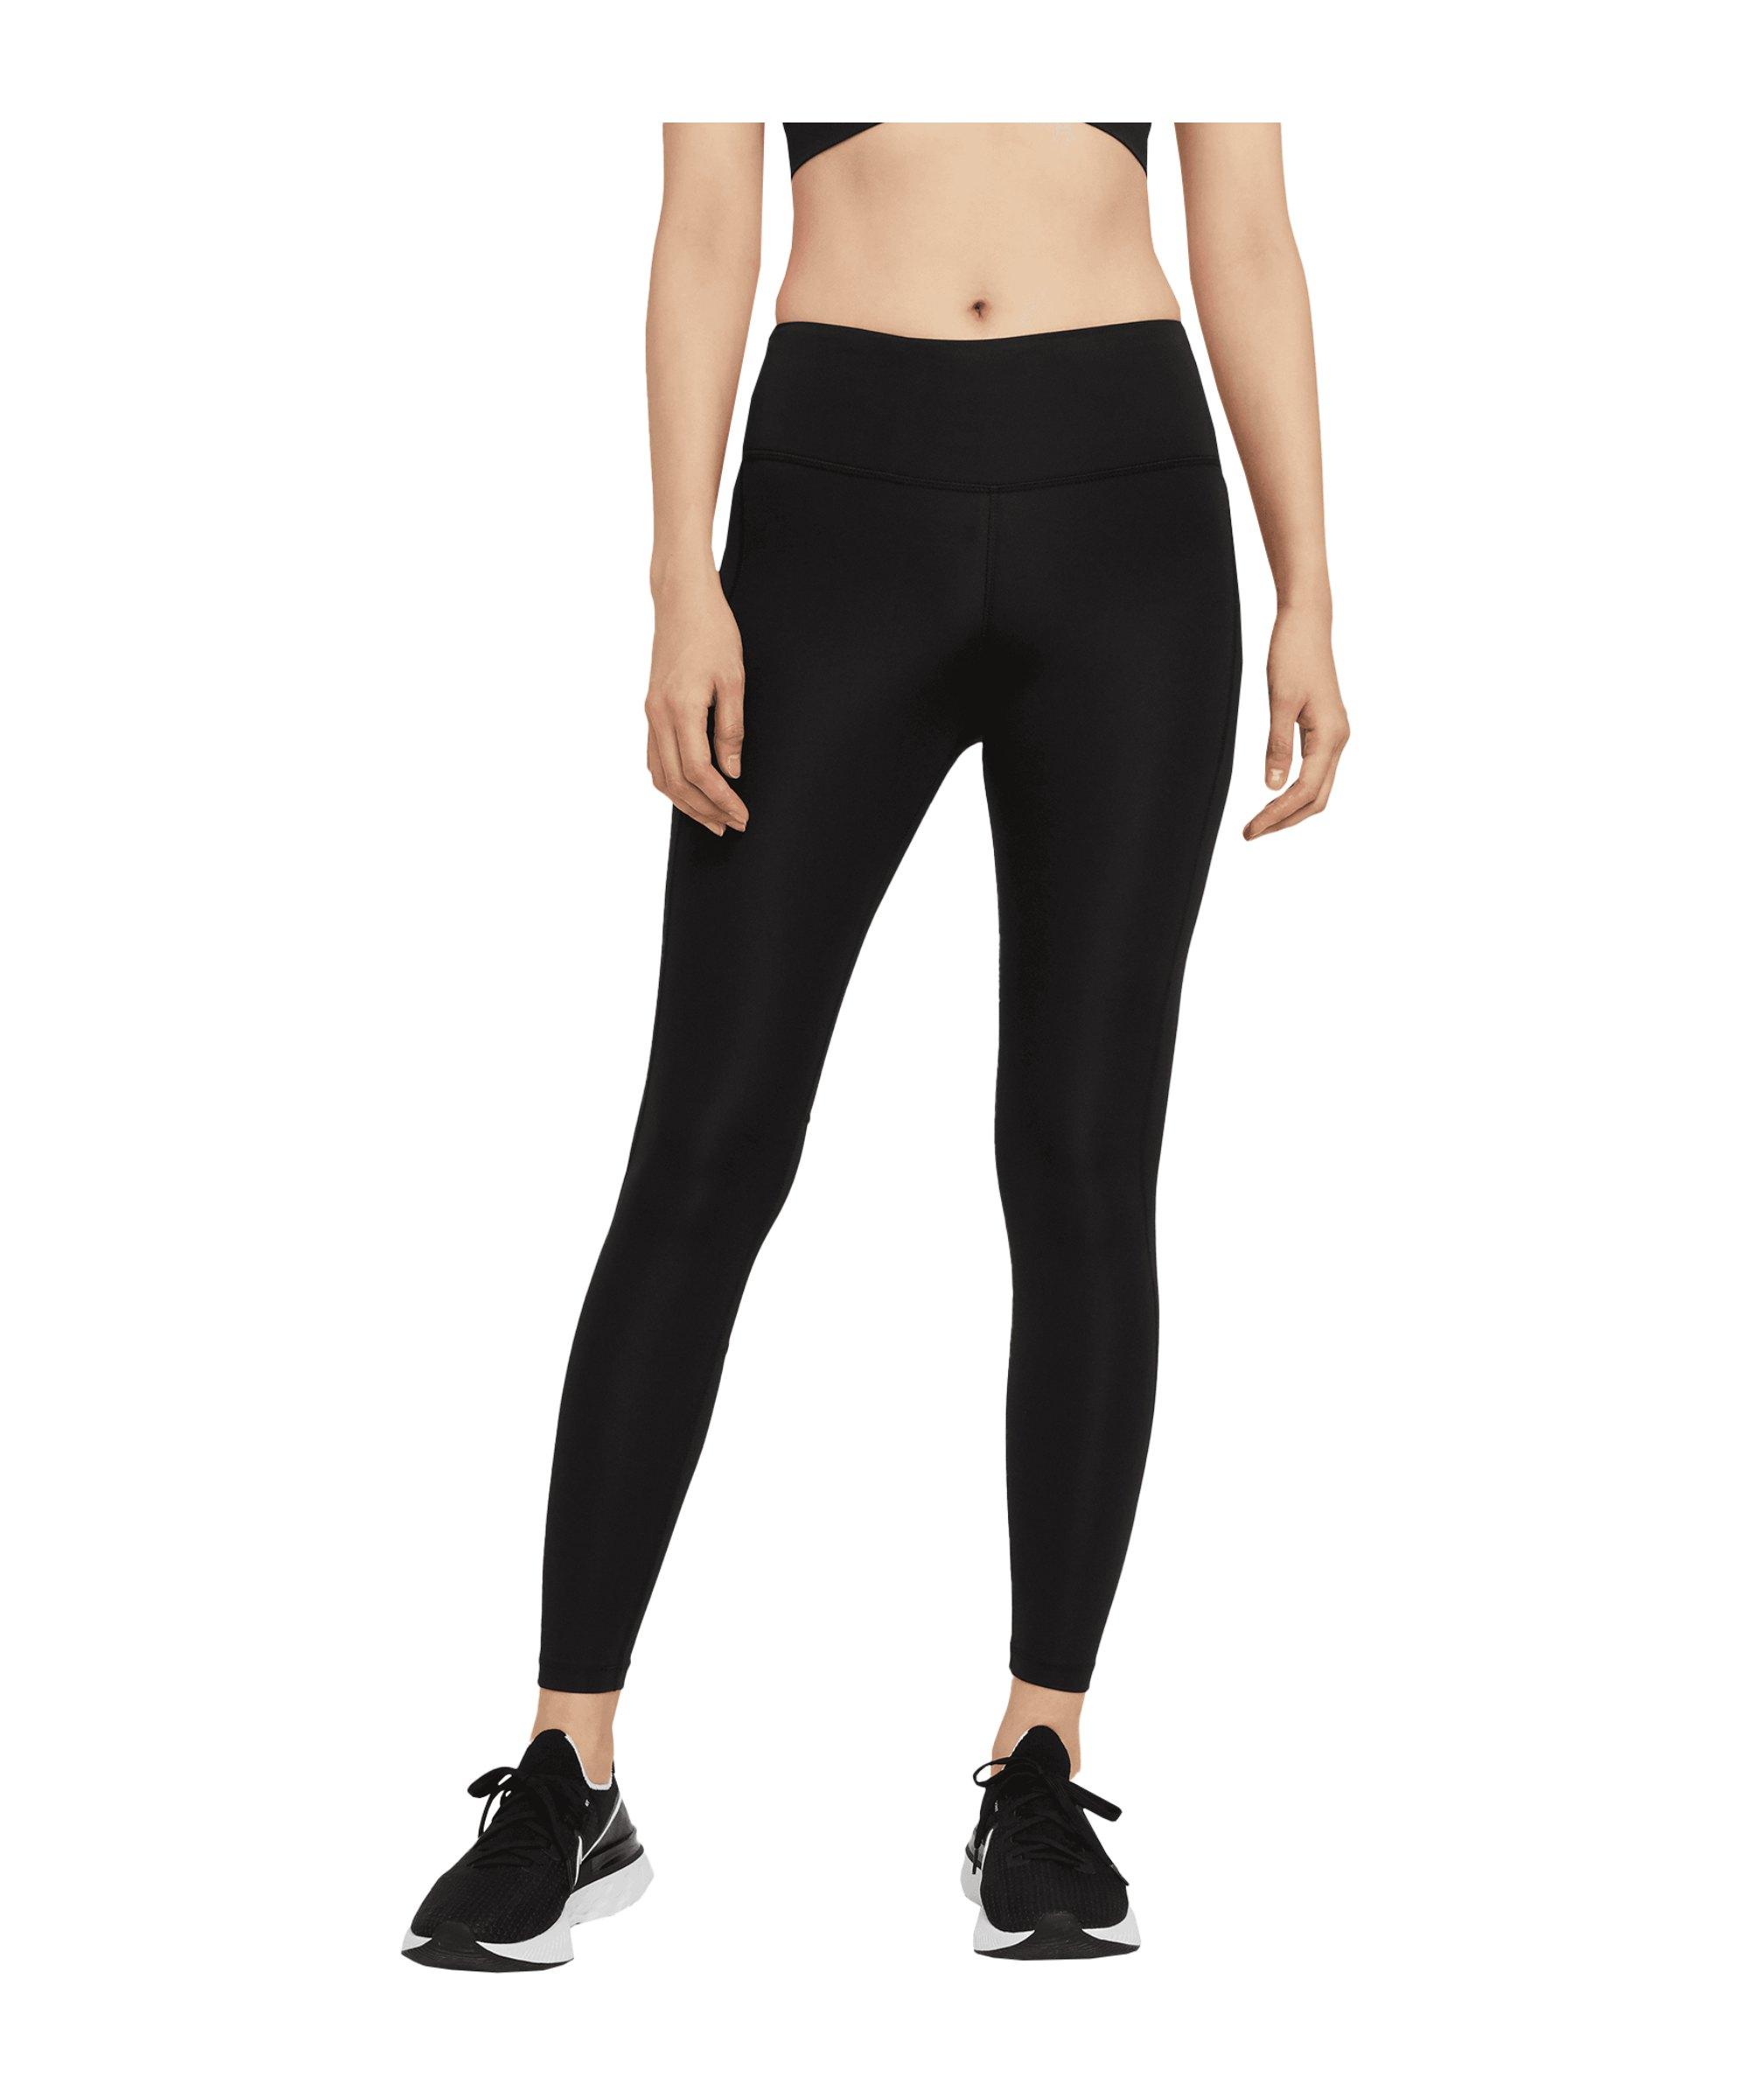 Nike Fast Leggings Running Damen Schwarz F010 - schwarz